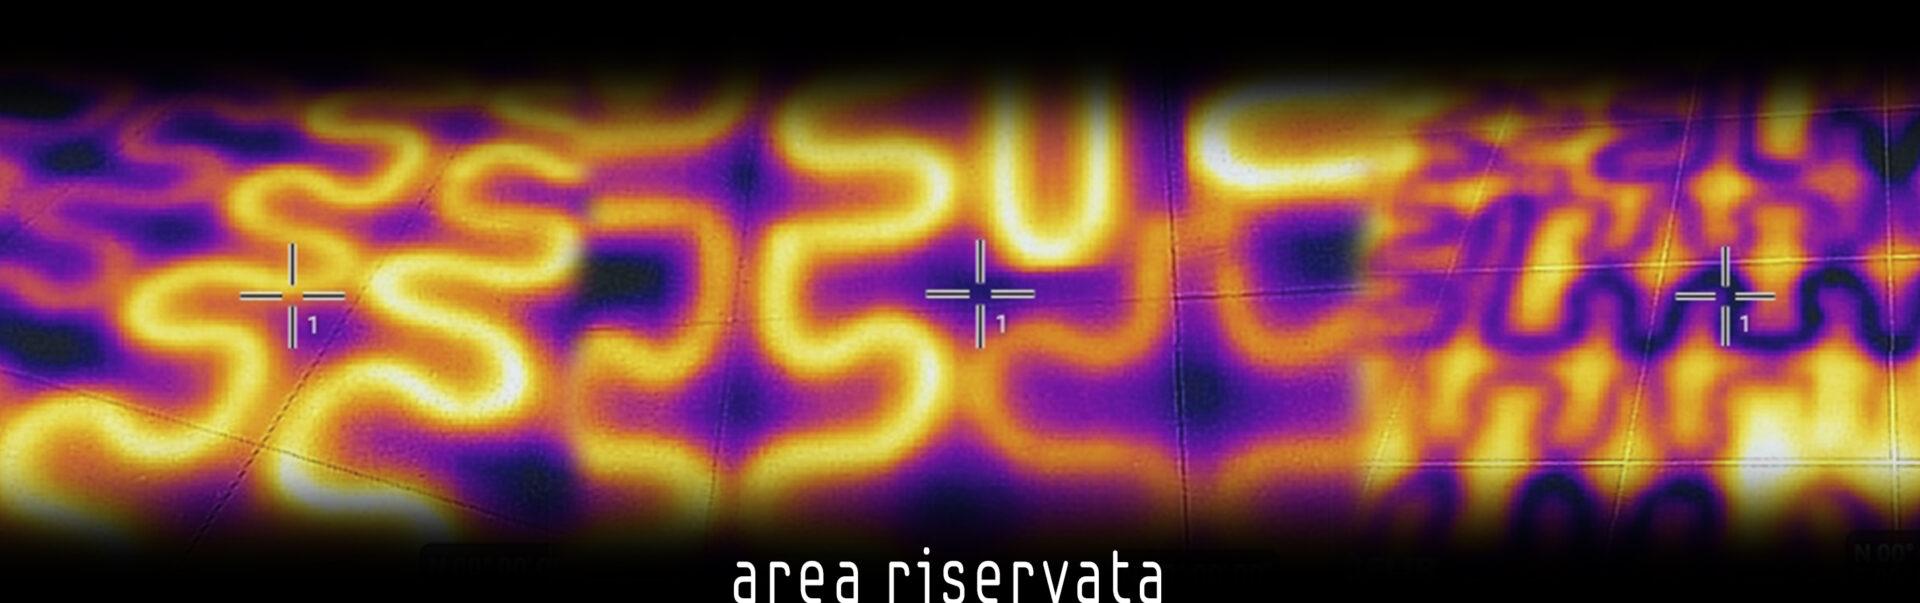 FOTO_HEADER-area-riservata_02